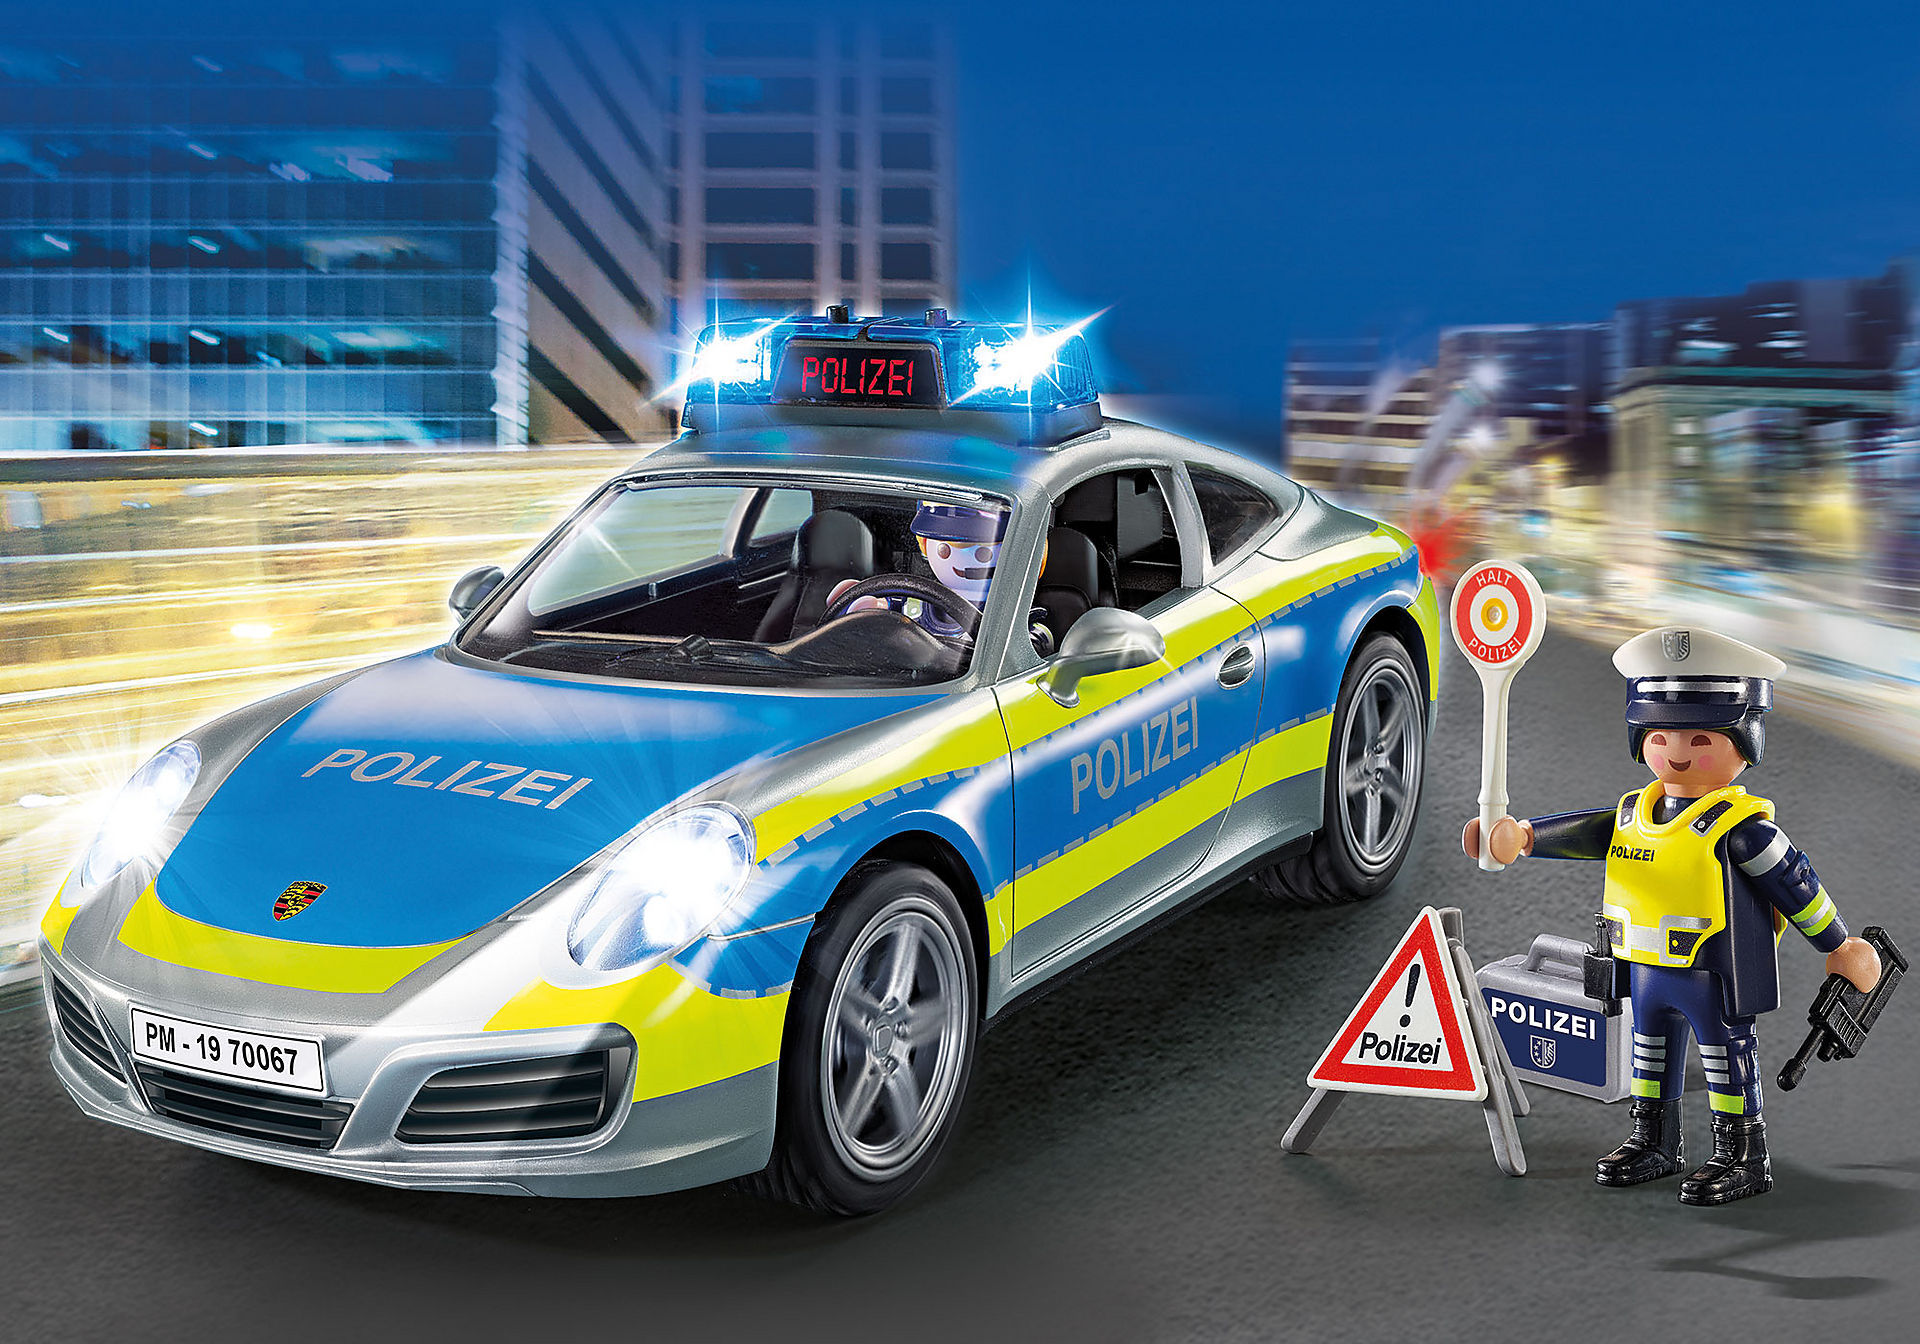 70067 Porsche 911 Carrera 4S Police zoom image1